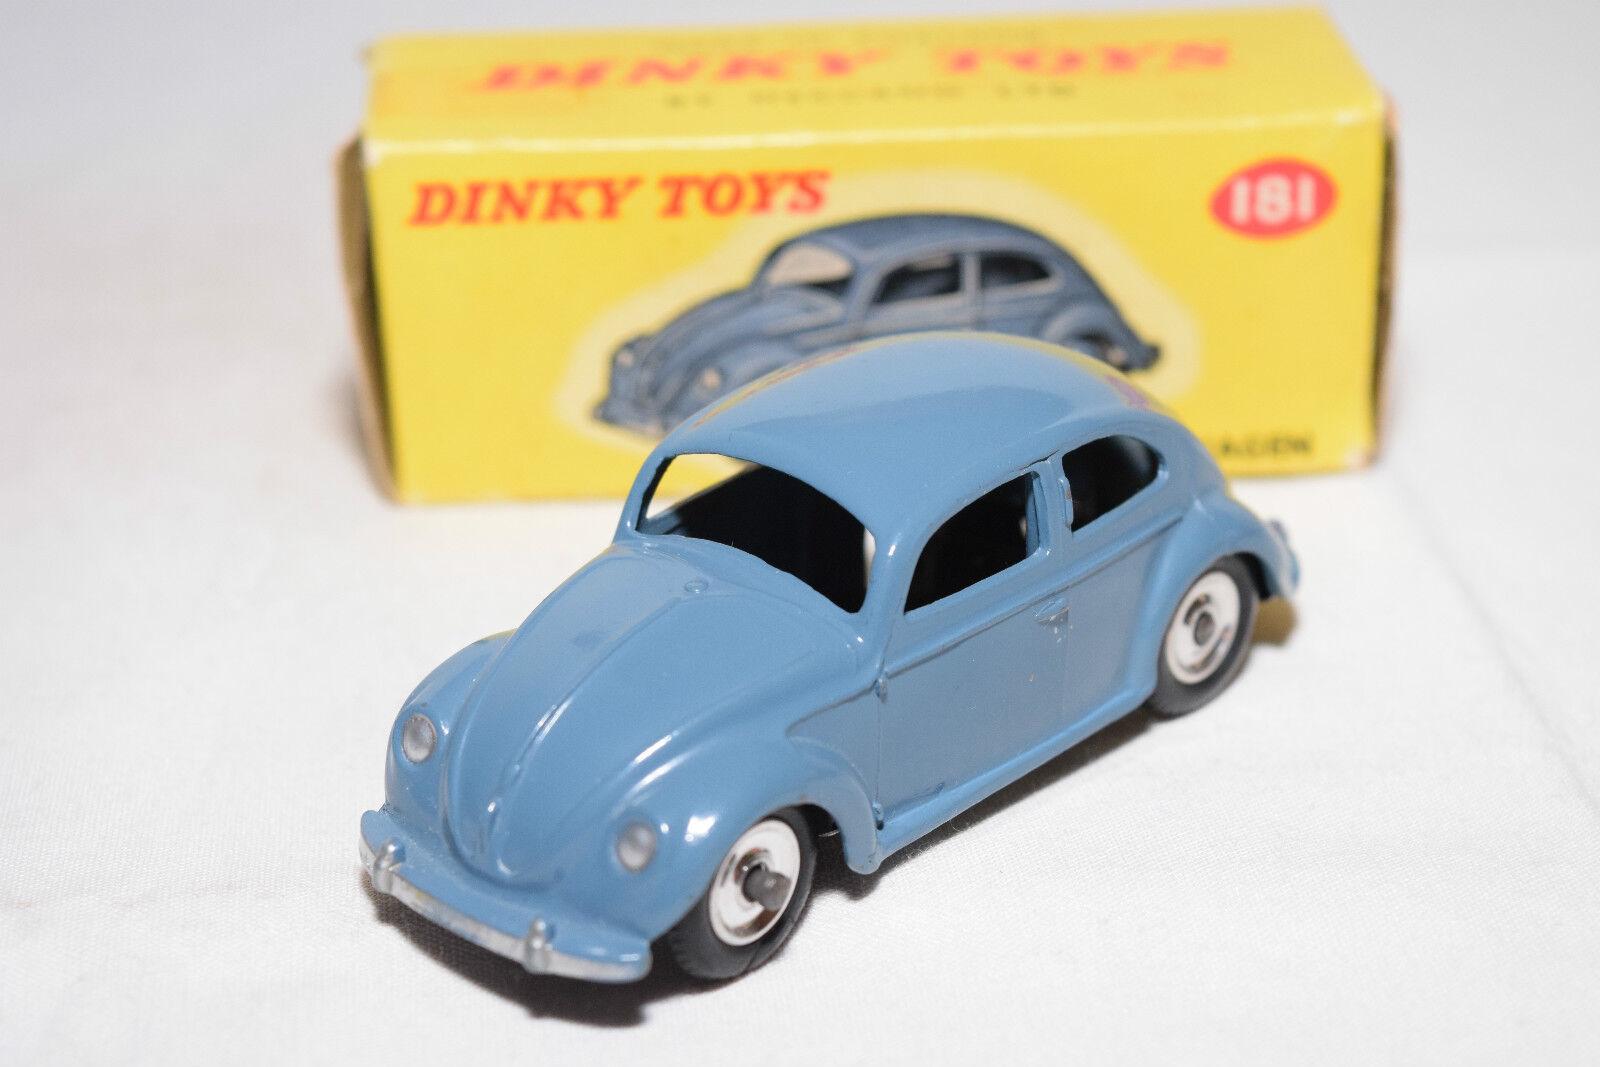 P DINKY TOYS 181 VW VOLKSWAGEN BEETLE KAFER bleu SPUN N MINT BOXED RARE SELTEN